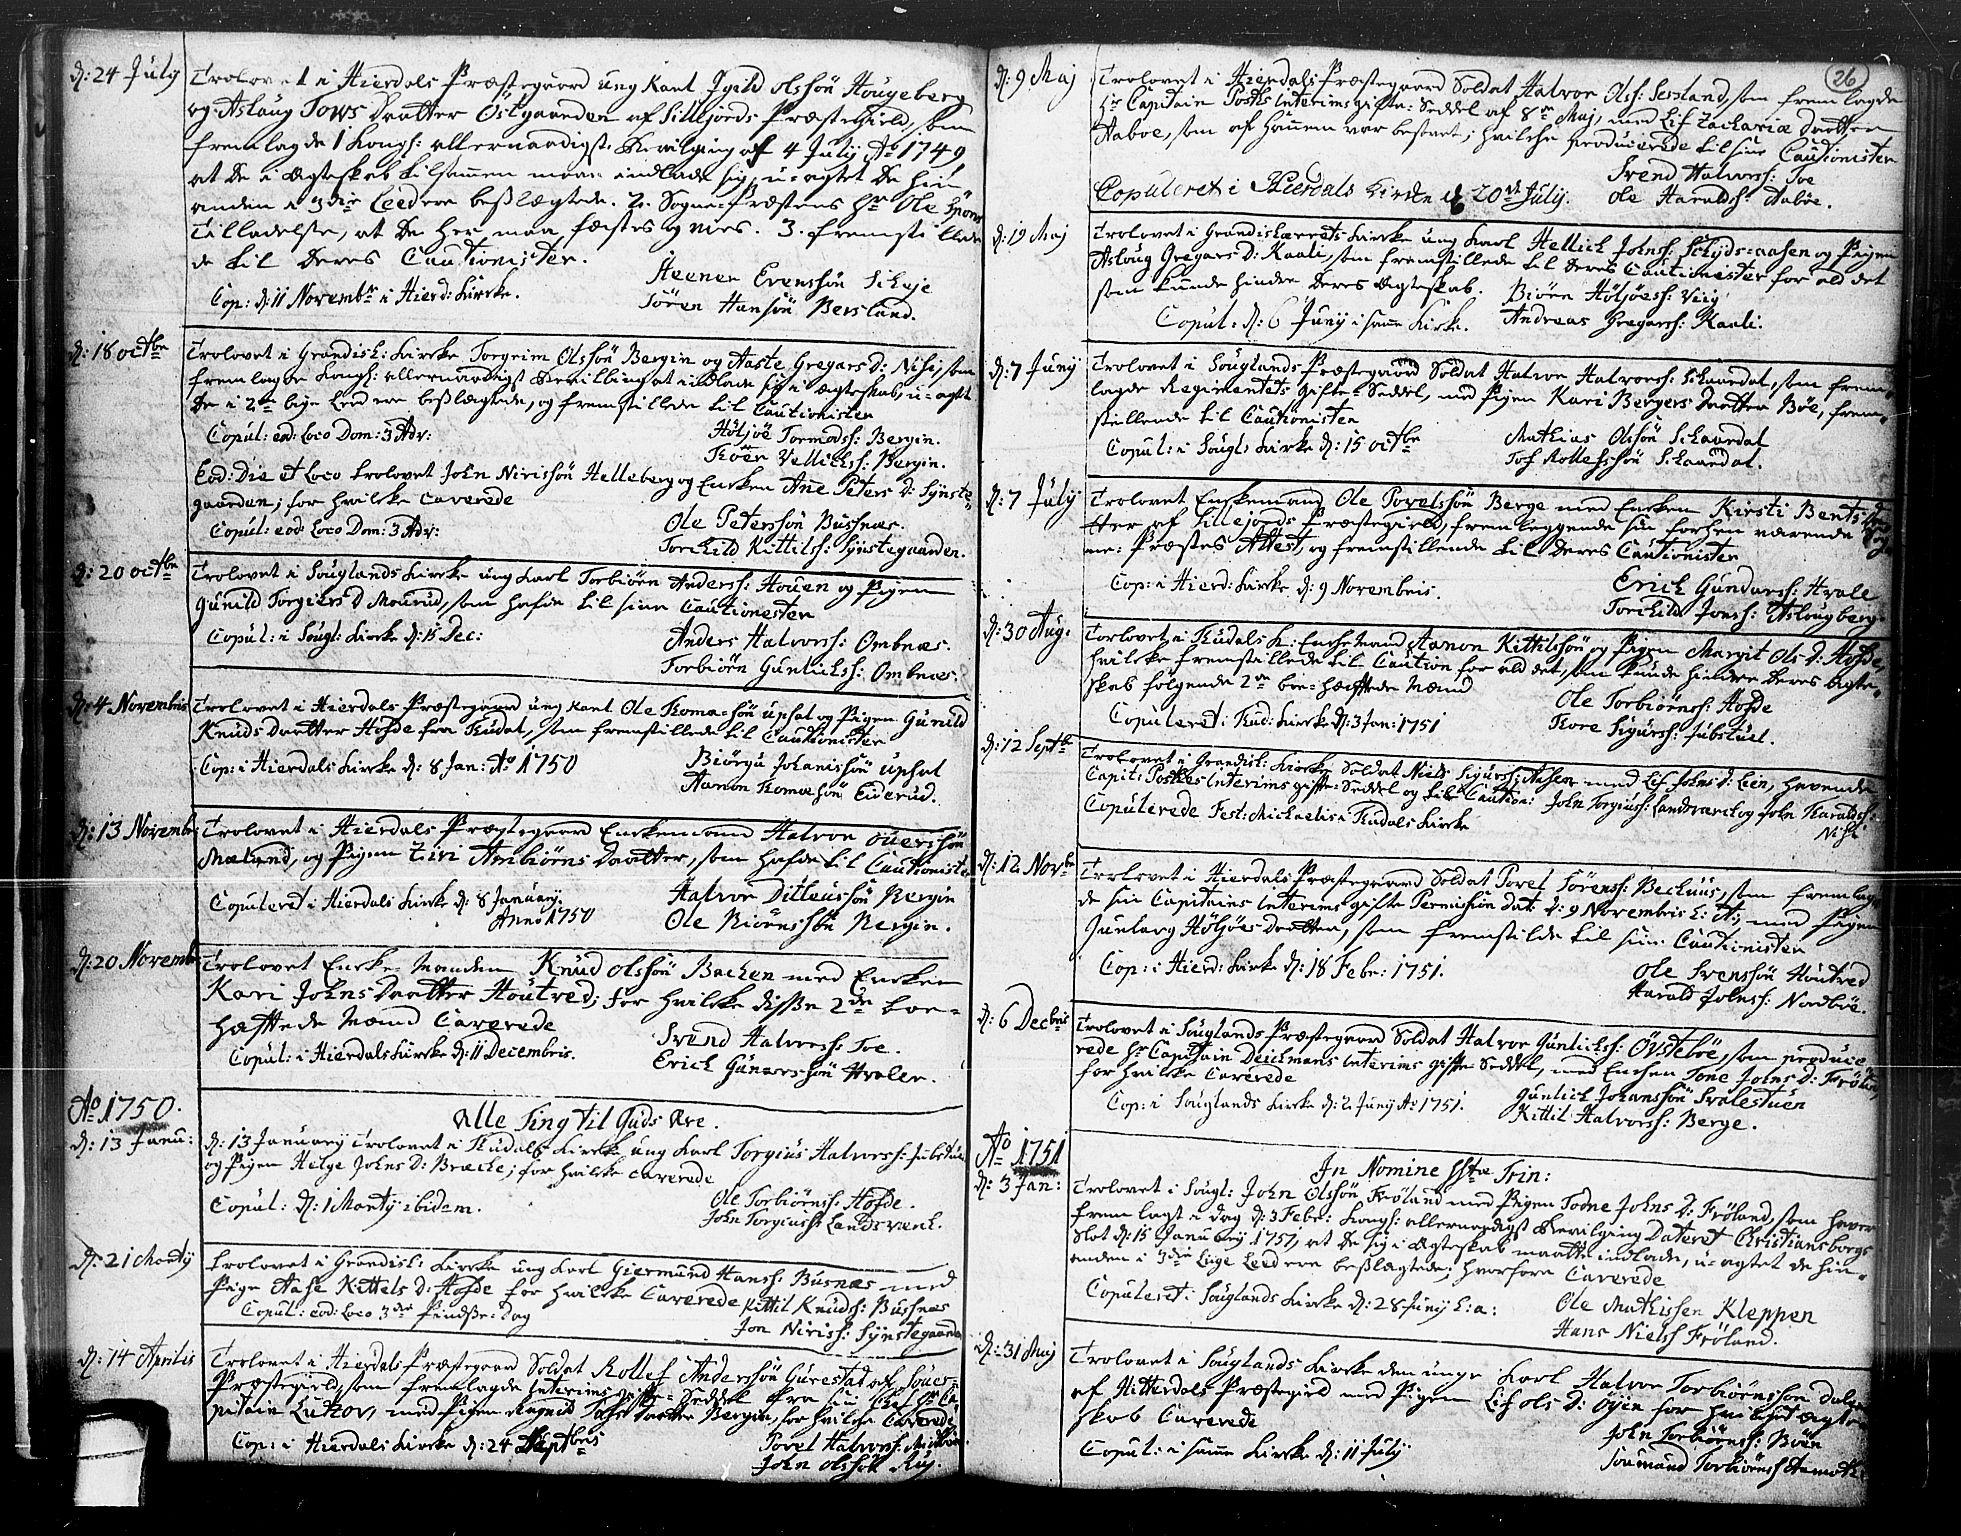 SAKO, Hjartdal kirkebøker, F/Fa/L0004: Ministerialbok nr. I 4, 1727-1795, s. 26